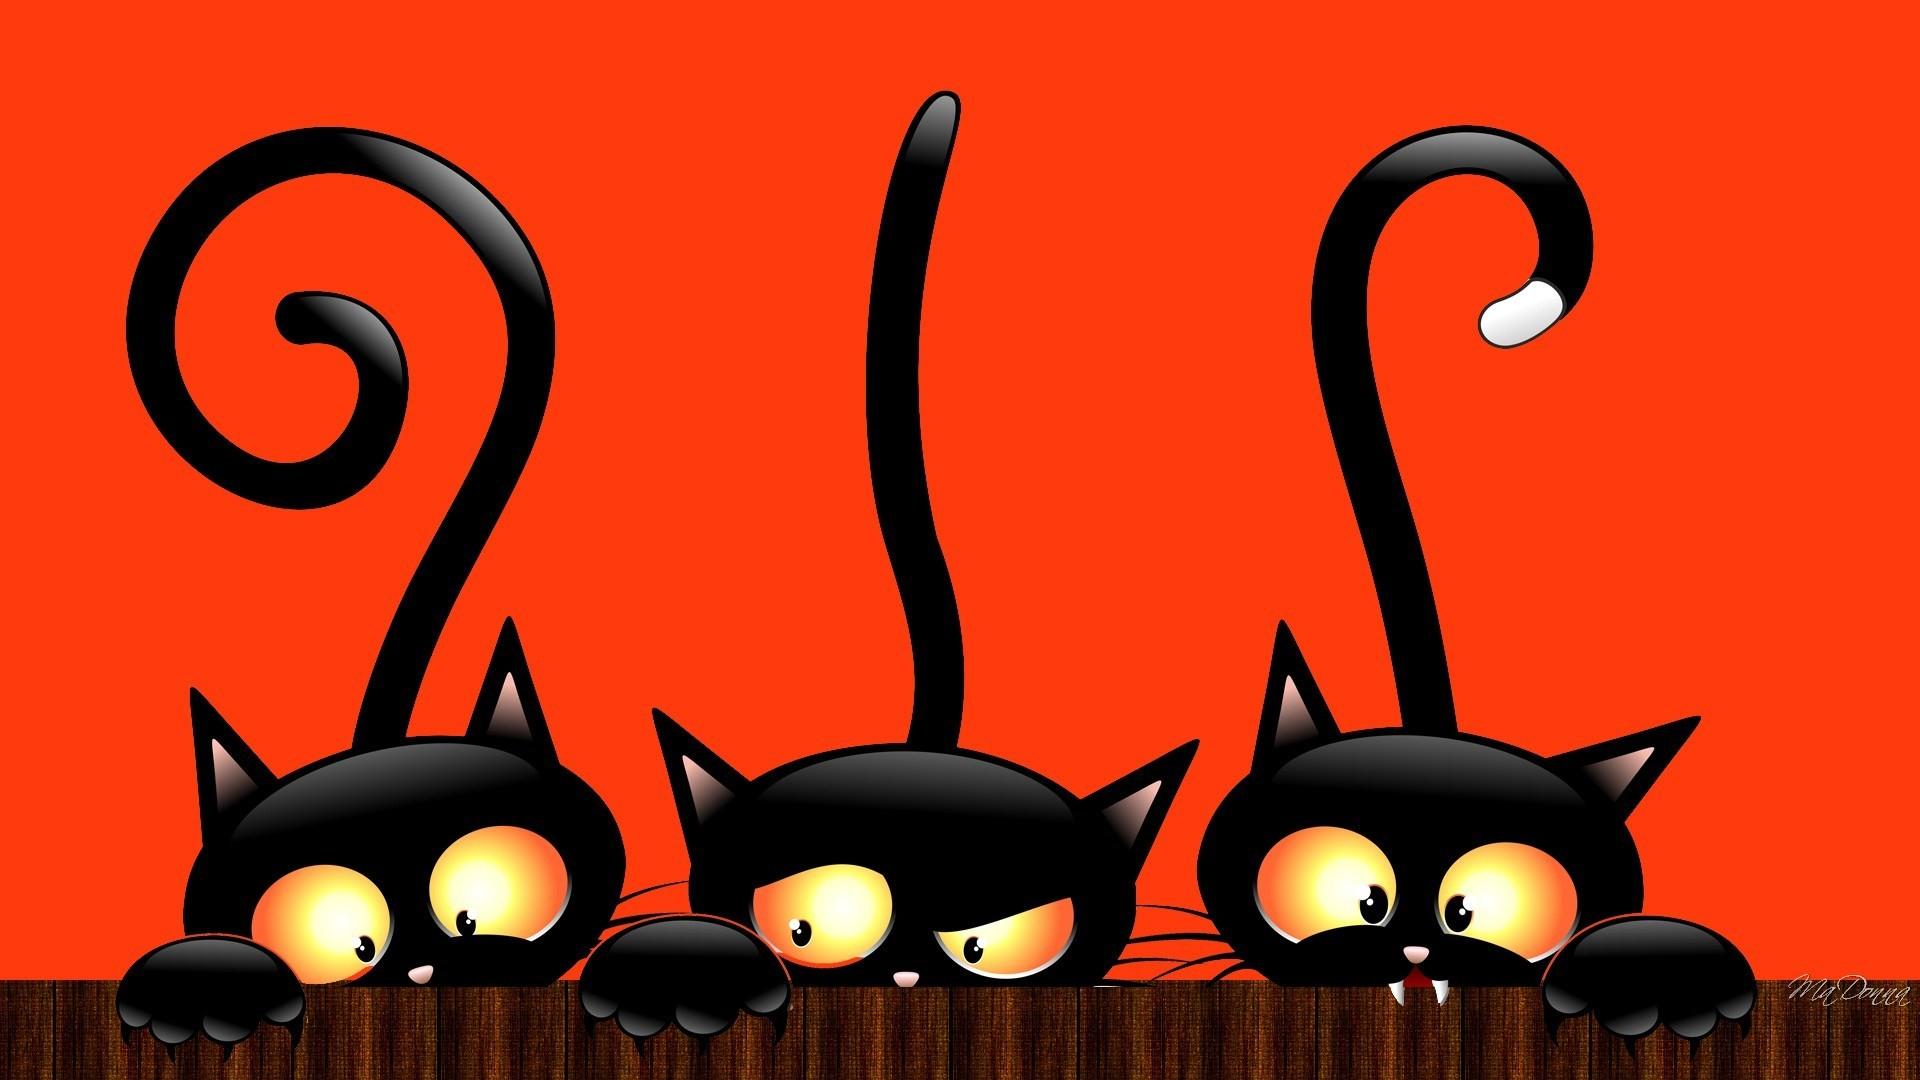 Download Hello Kitty Halloween Wallpaper Desktop Hd